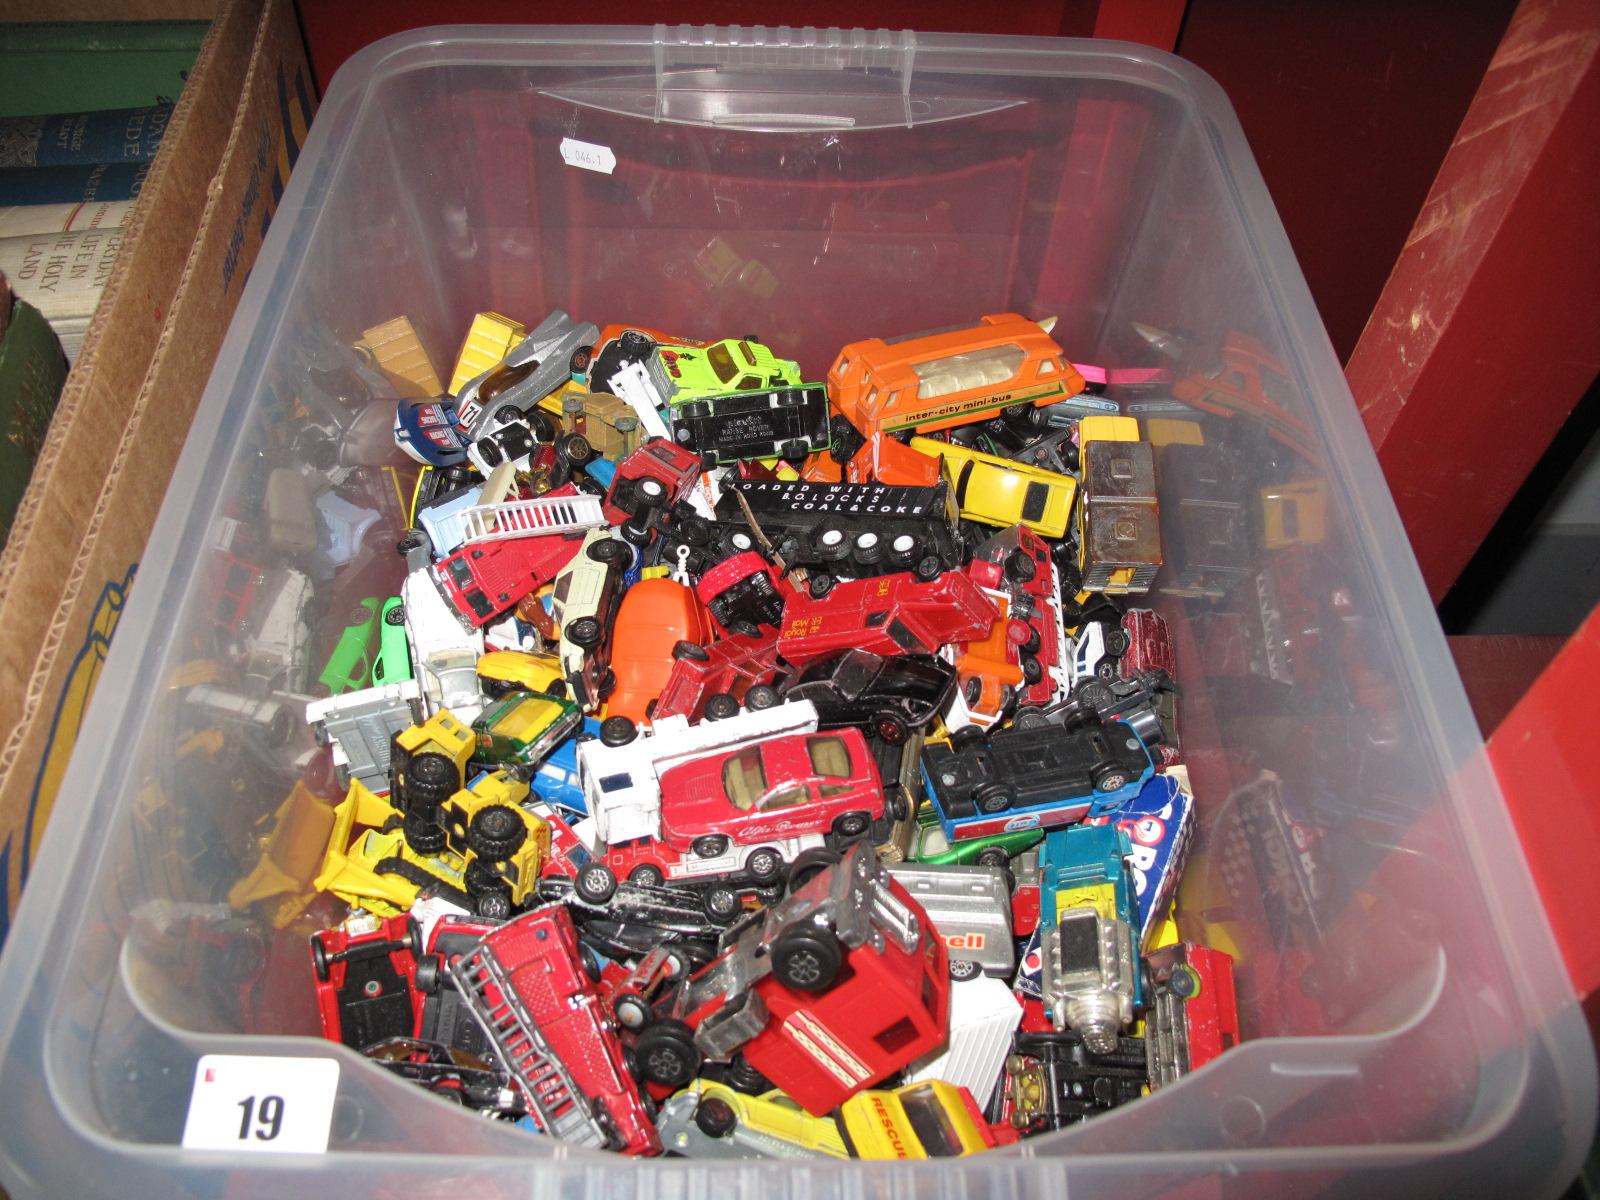 Lot 19 - A Collection of Over 100 Playworn Diecast Vehicles, including Matchbox, Corgi, Majorette, etc:-